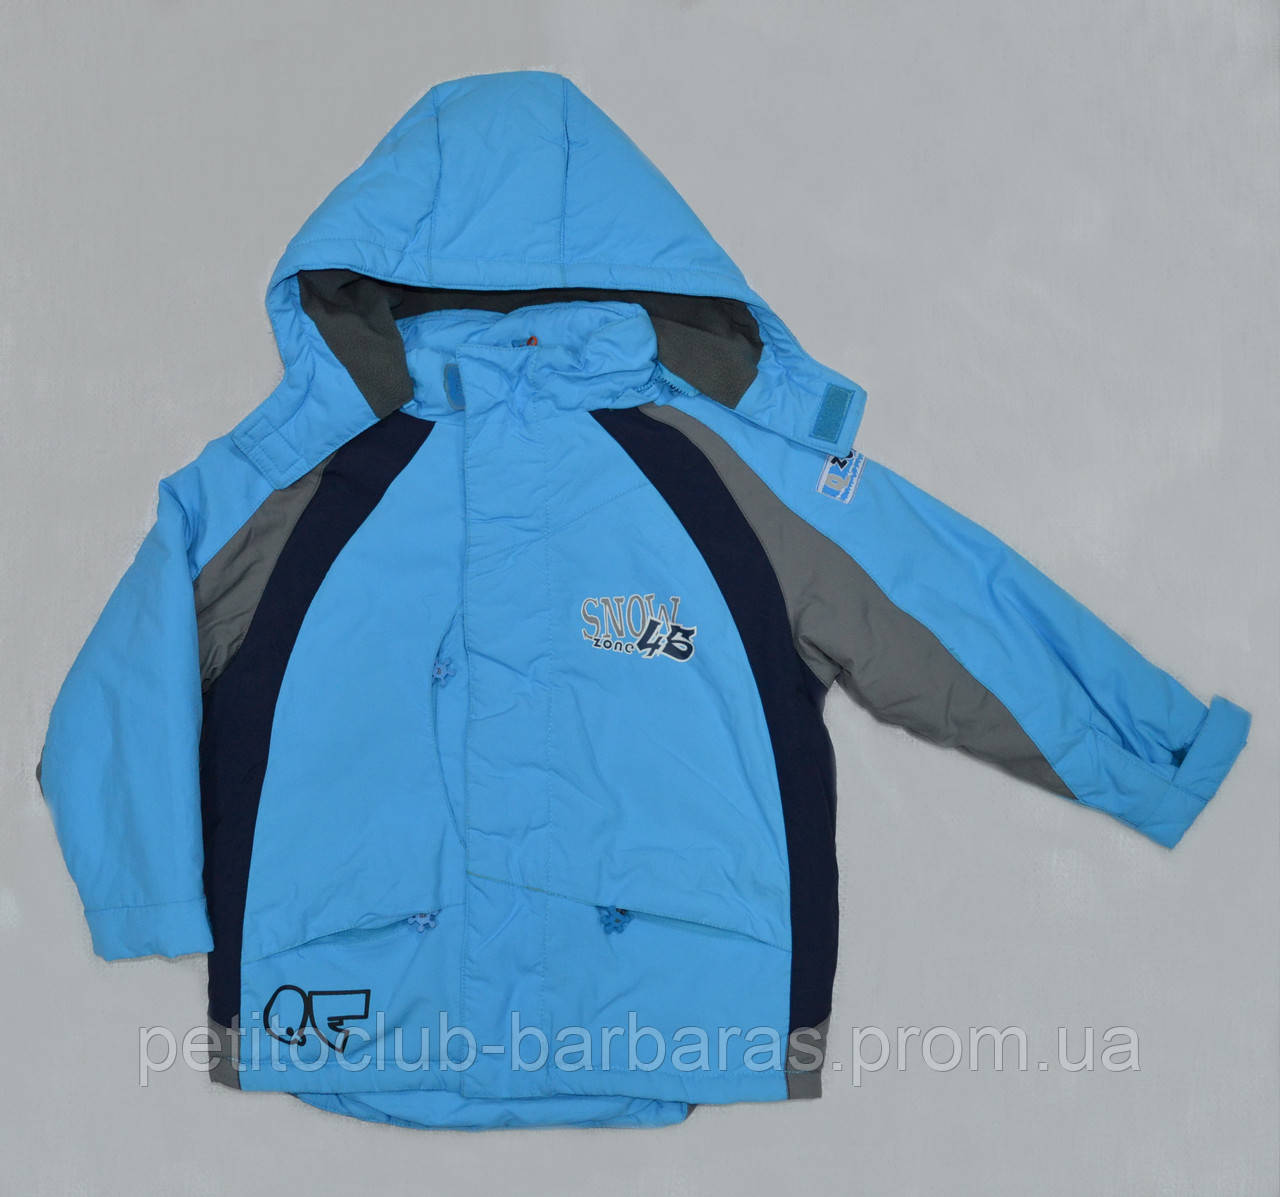 Куртка зимняя Snowzone 45 голубая (QuadriFoglio, Польша)